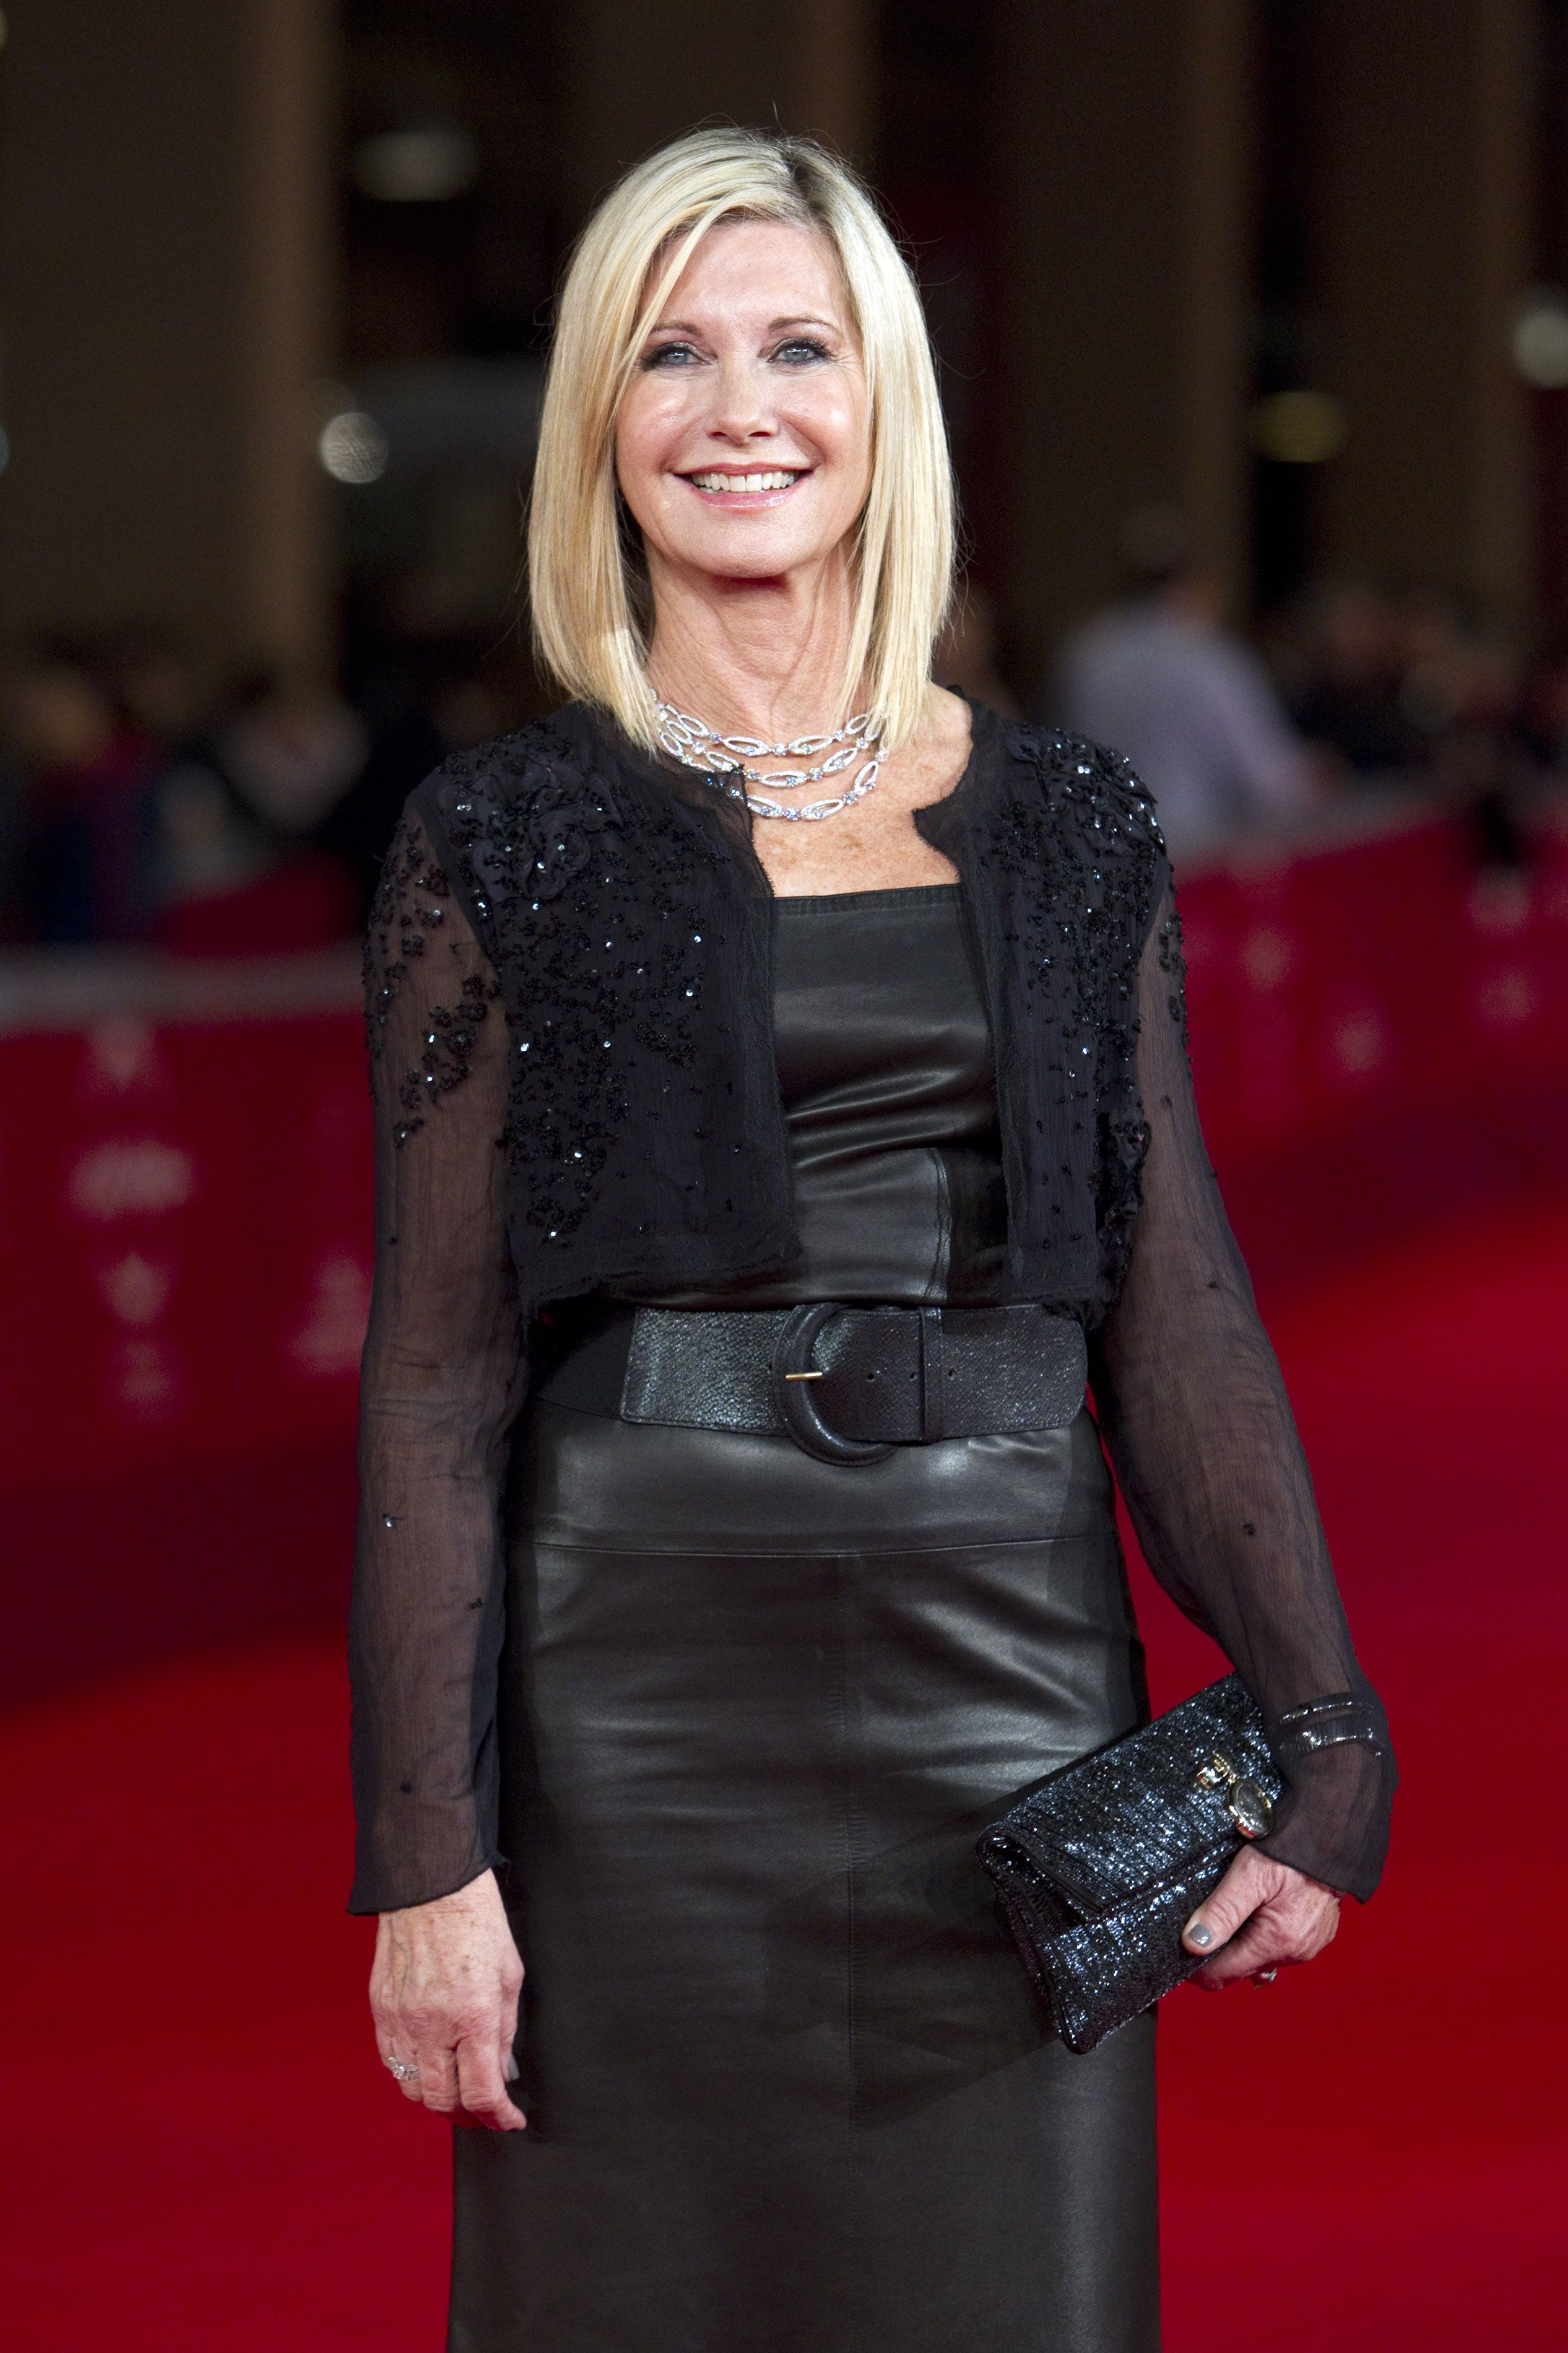 Celebrities In Leather: Olivia Newton John in leather ... Olivia Newton John